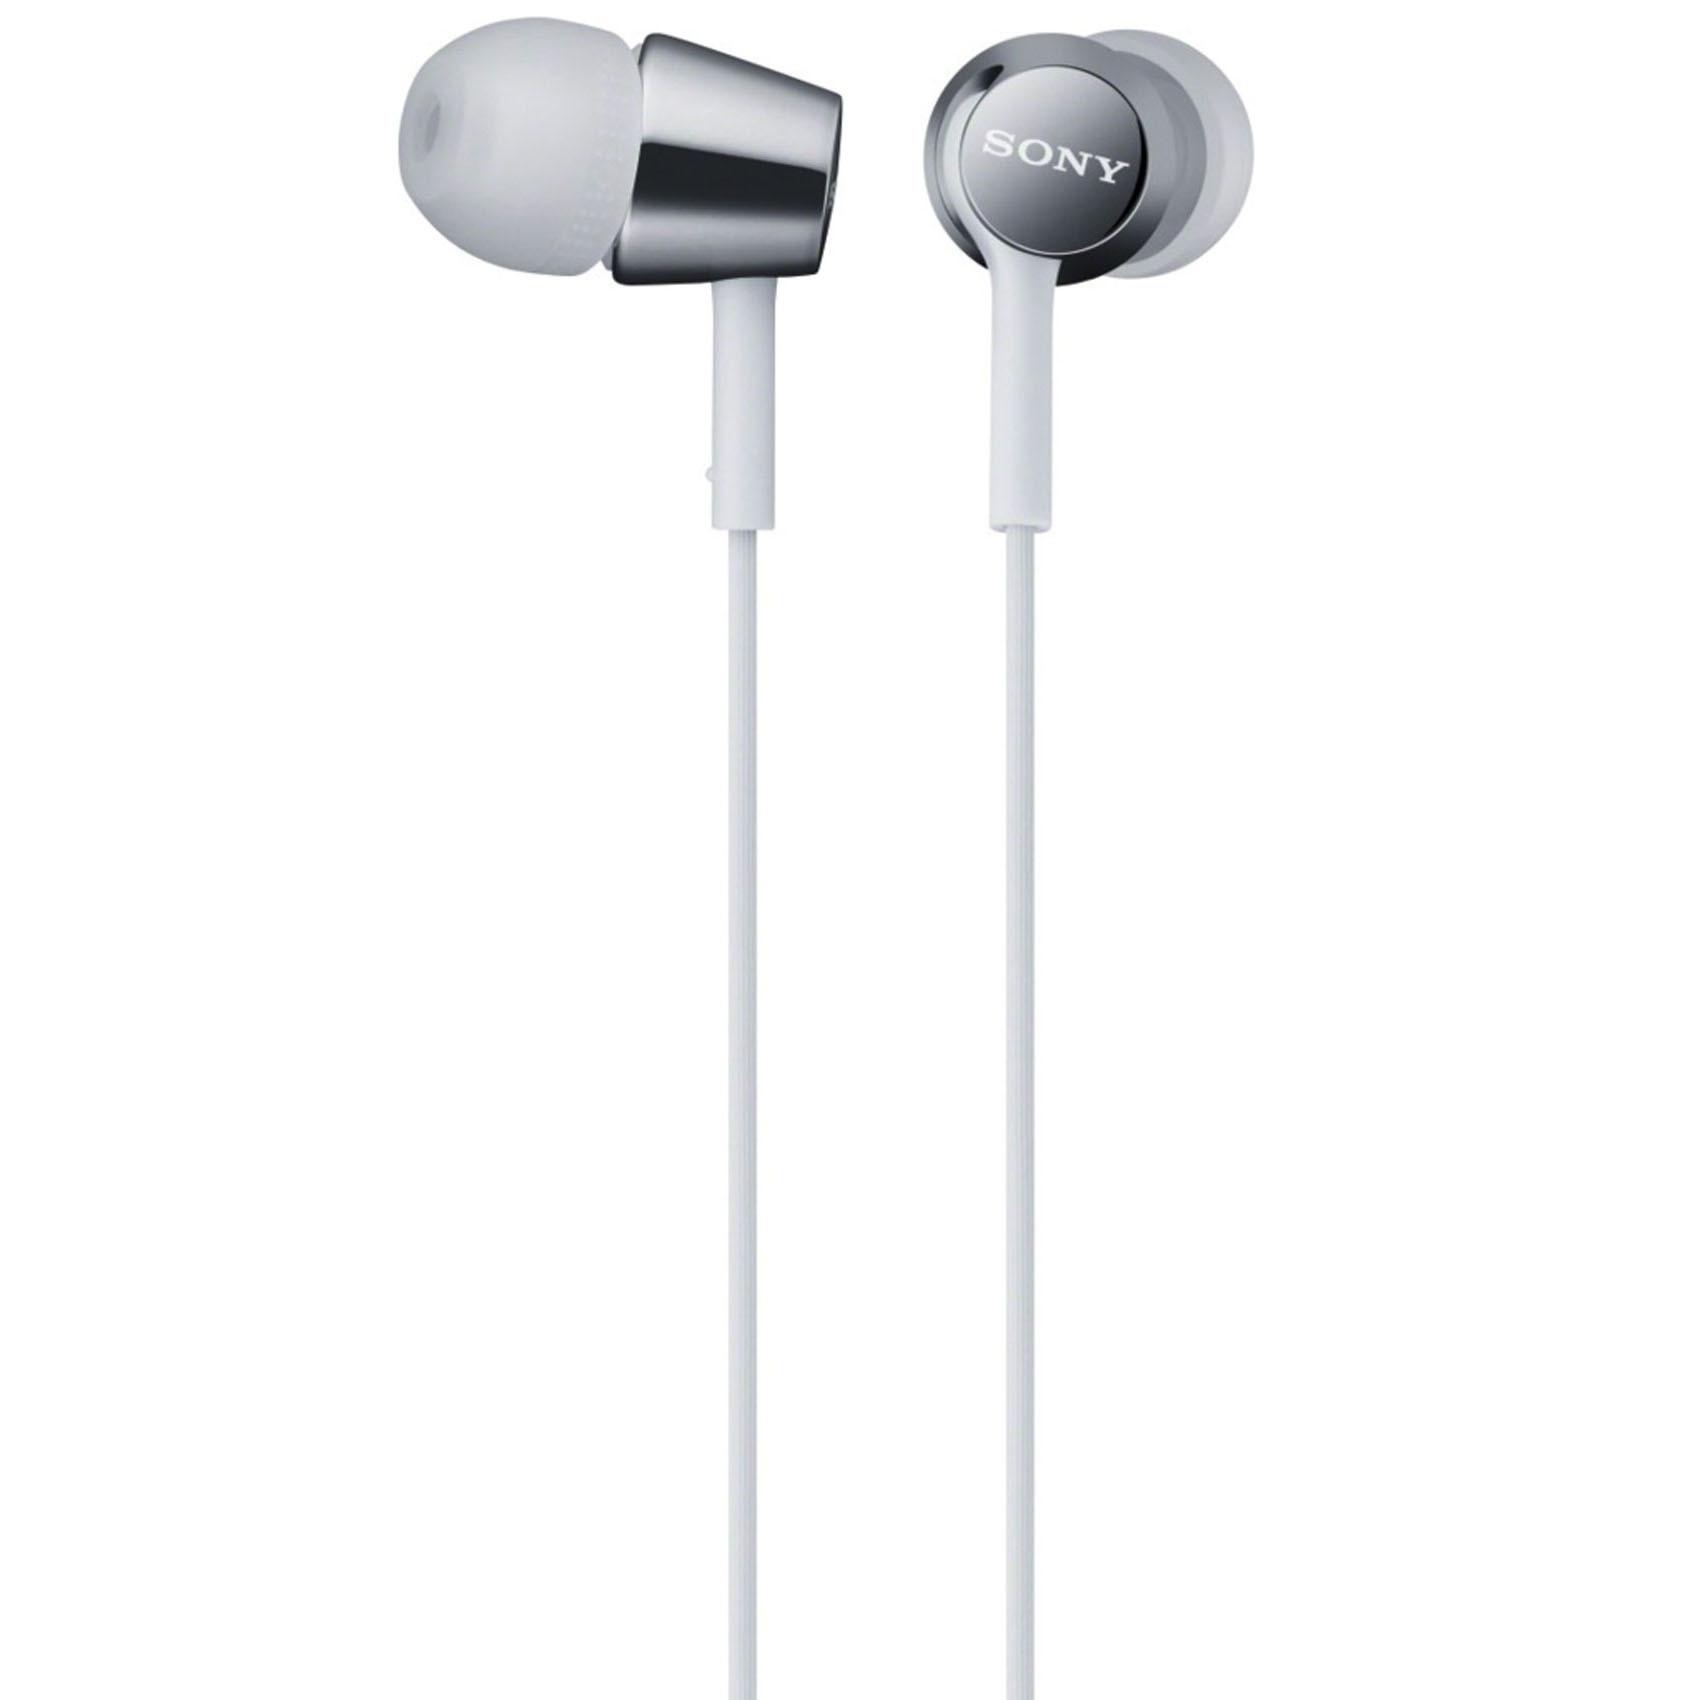 Buy Sony Headphone Mdr Ex150lp White Online In Uae Carrefour Beats Solo Hd1 Headph Mdrex150lp W